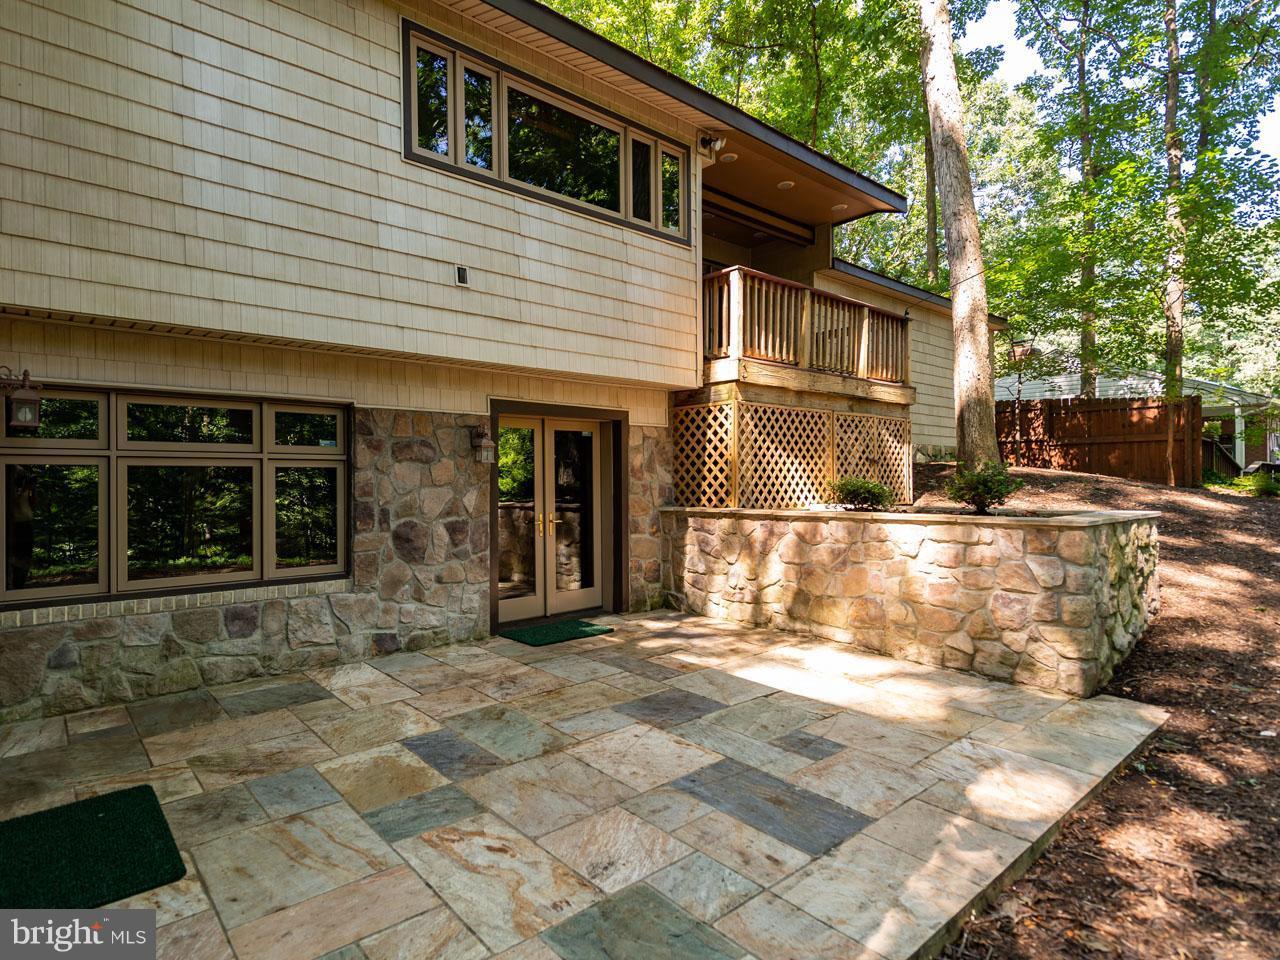 1002303700-300502419426-2021-07-22-03-27-23  |   | Alexandria Delaware Real Estate For Sale | MLS# 1002303700  - Best of Northern Virginia